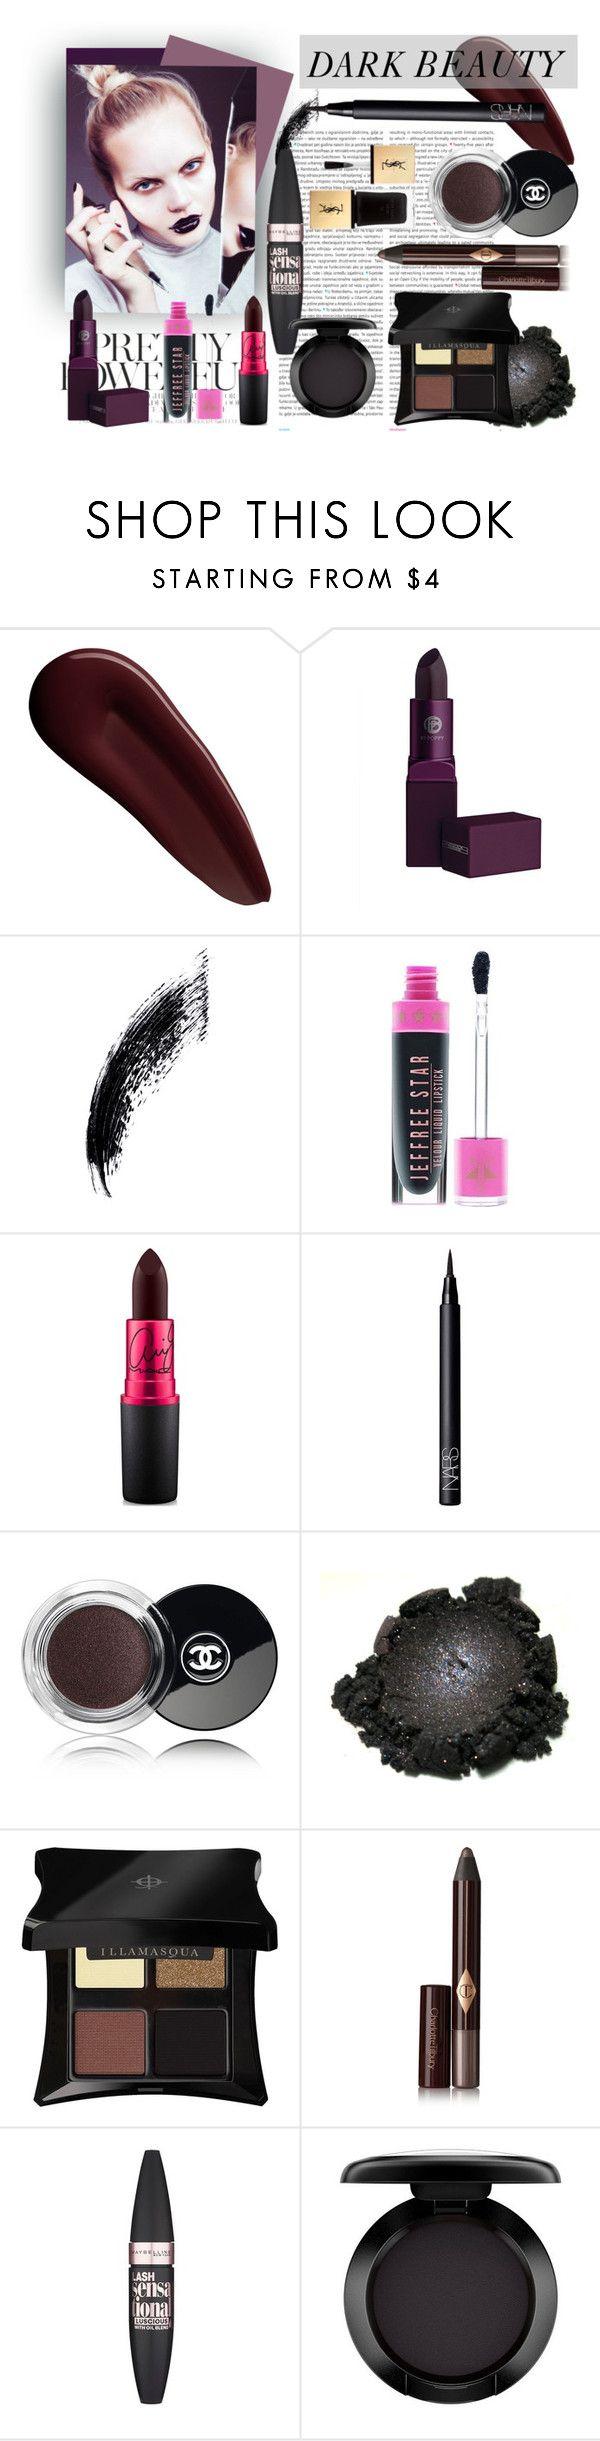 """Dark Beauty"" by eirini-kastrou on Polyvore featuring beauty, Surratt, Lipstick Queen, Oris, MAC Cosmetics, NARS Cosmetics, Chanel, Illamasqua, Charlotte Tilbury and Maybelline"